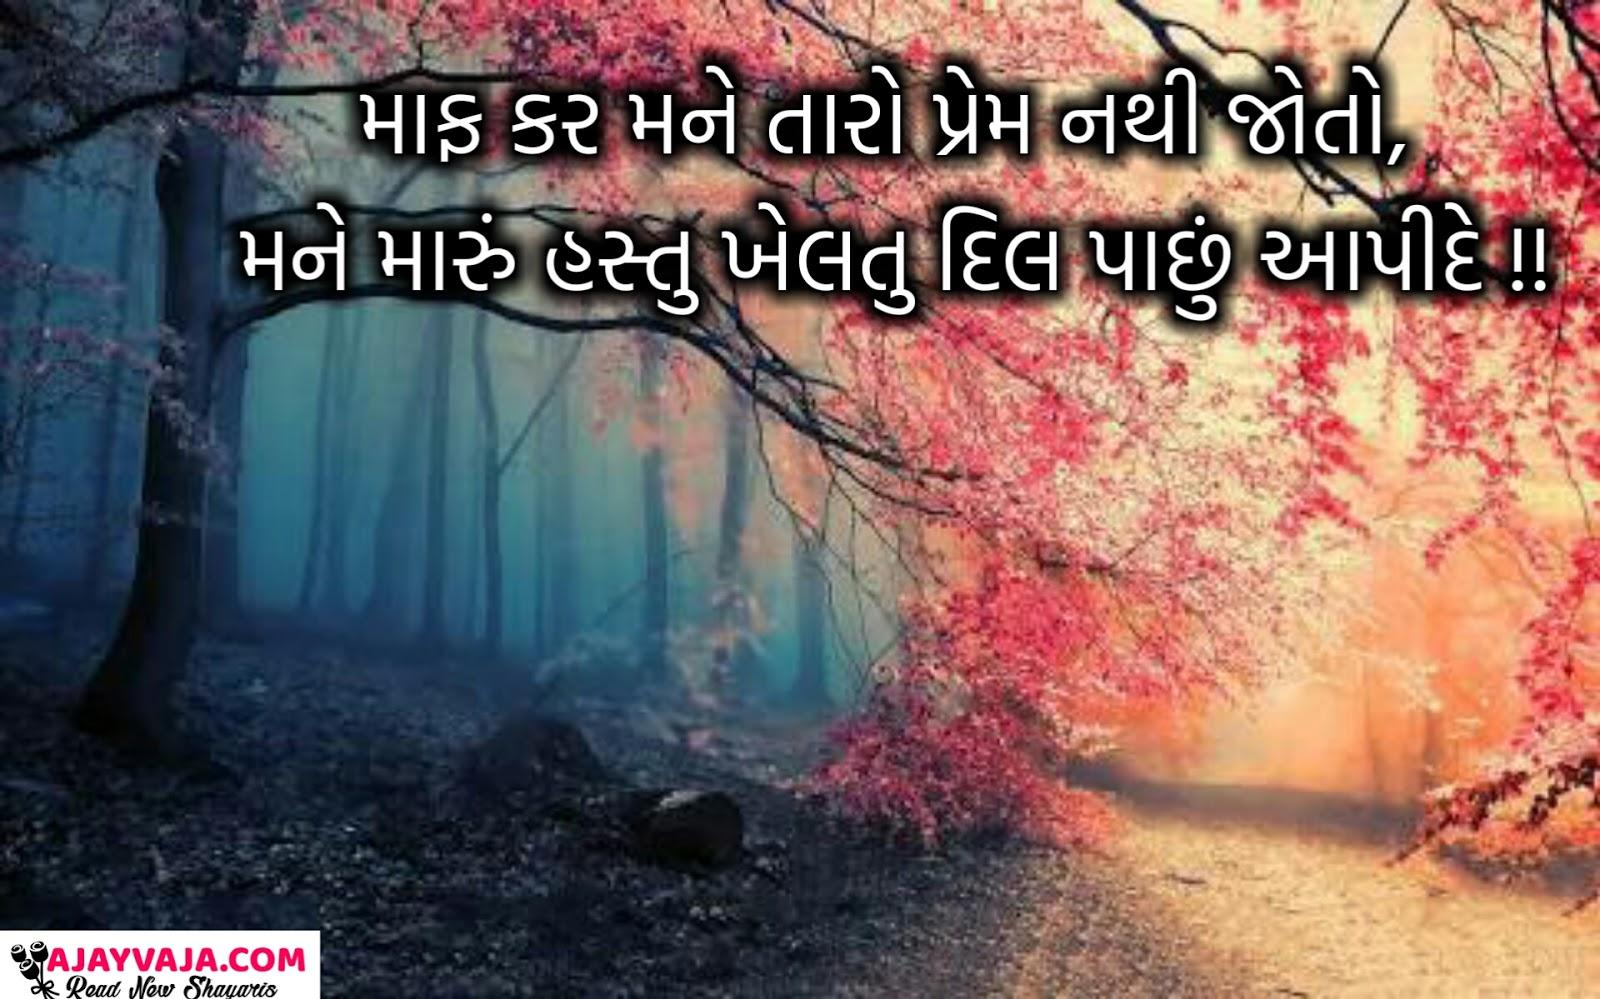 Best Gujarati images